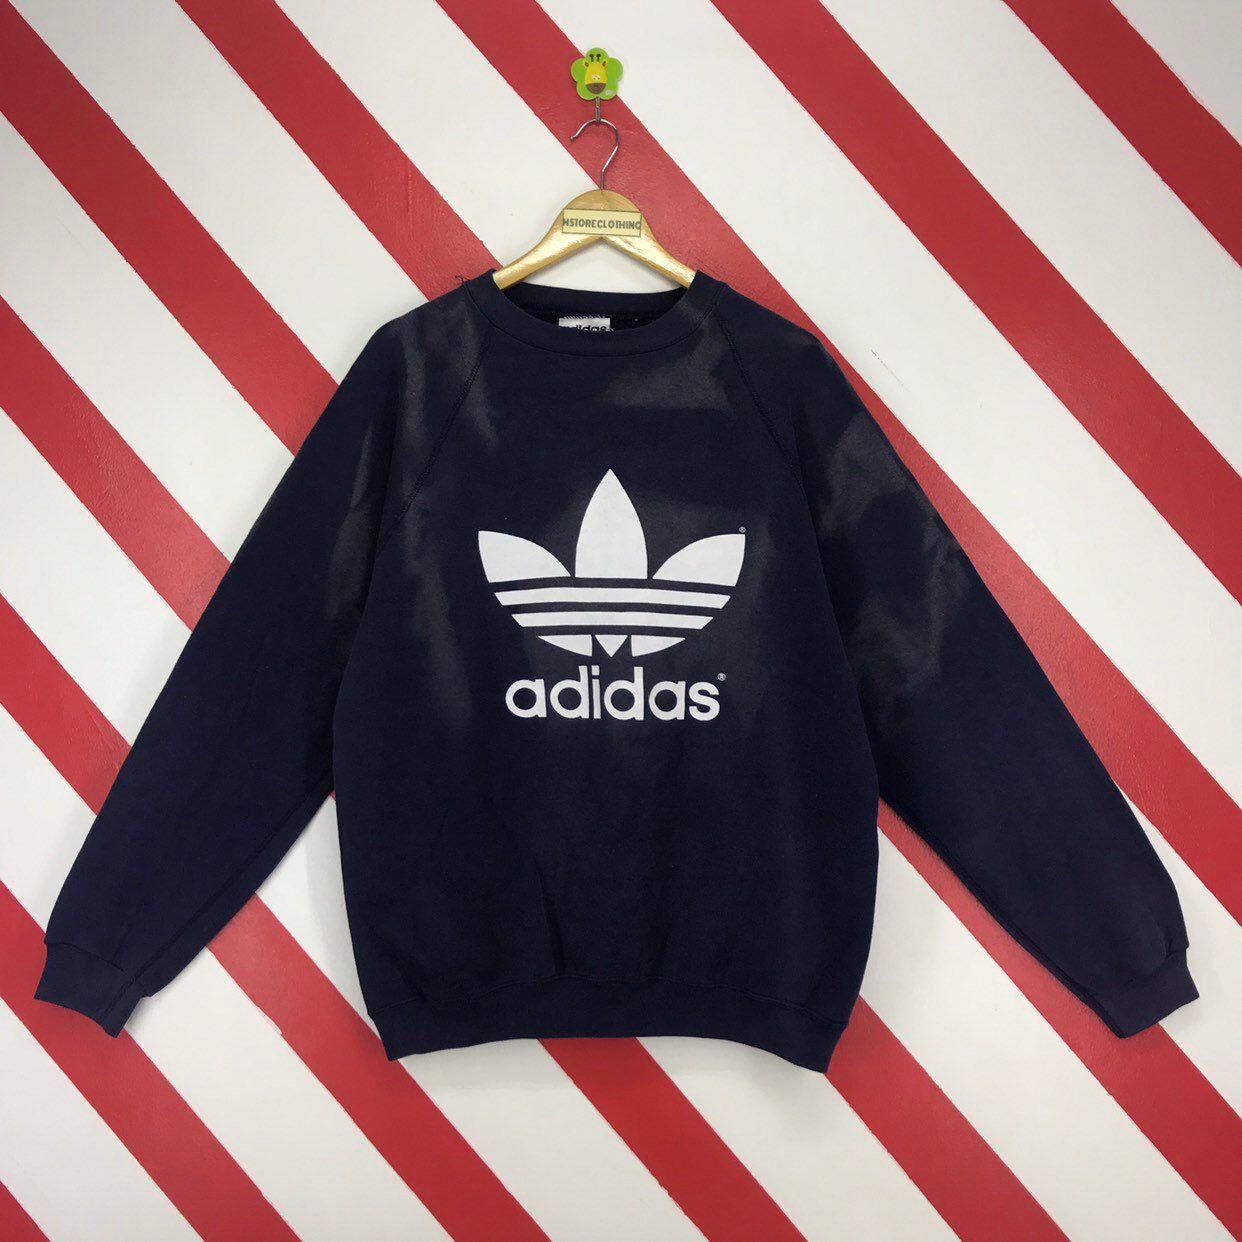 Nwt Adidas Trefoil Crew Sweatshirt A Fresh Take On A Classic Logo Style A Big Trefoil Logo And A Box Of Color Crea Crew Sweatshirts Sweatshirts Adidas Sweater [ 1740 x 580 Pixel ]